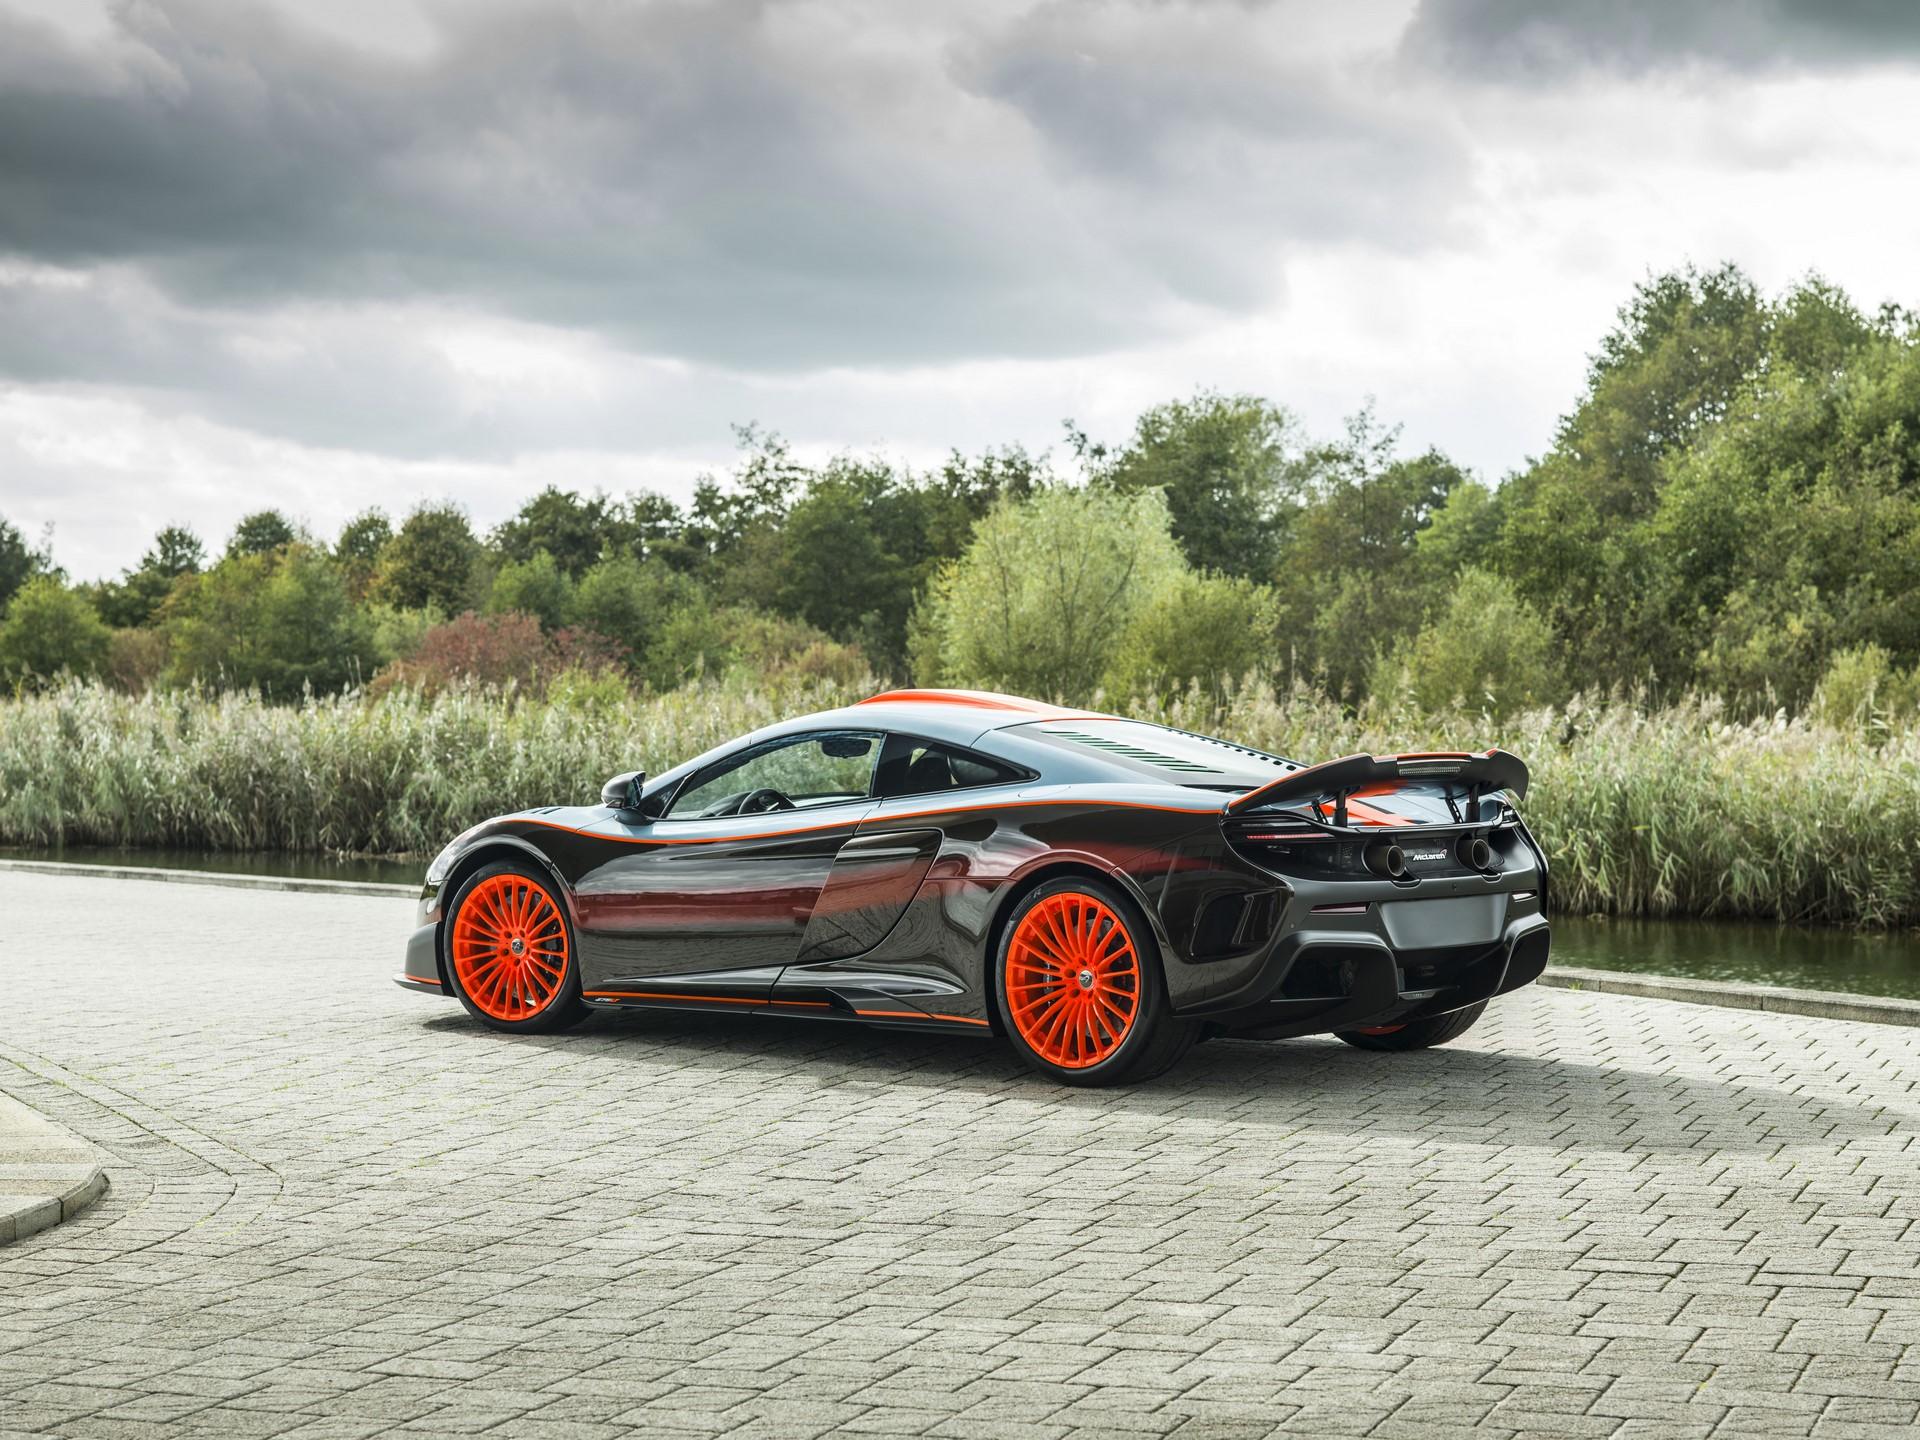 MSO Gulf Racing theme McLaren 675LT_02_exterior - resized_GF Williams